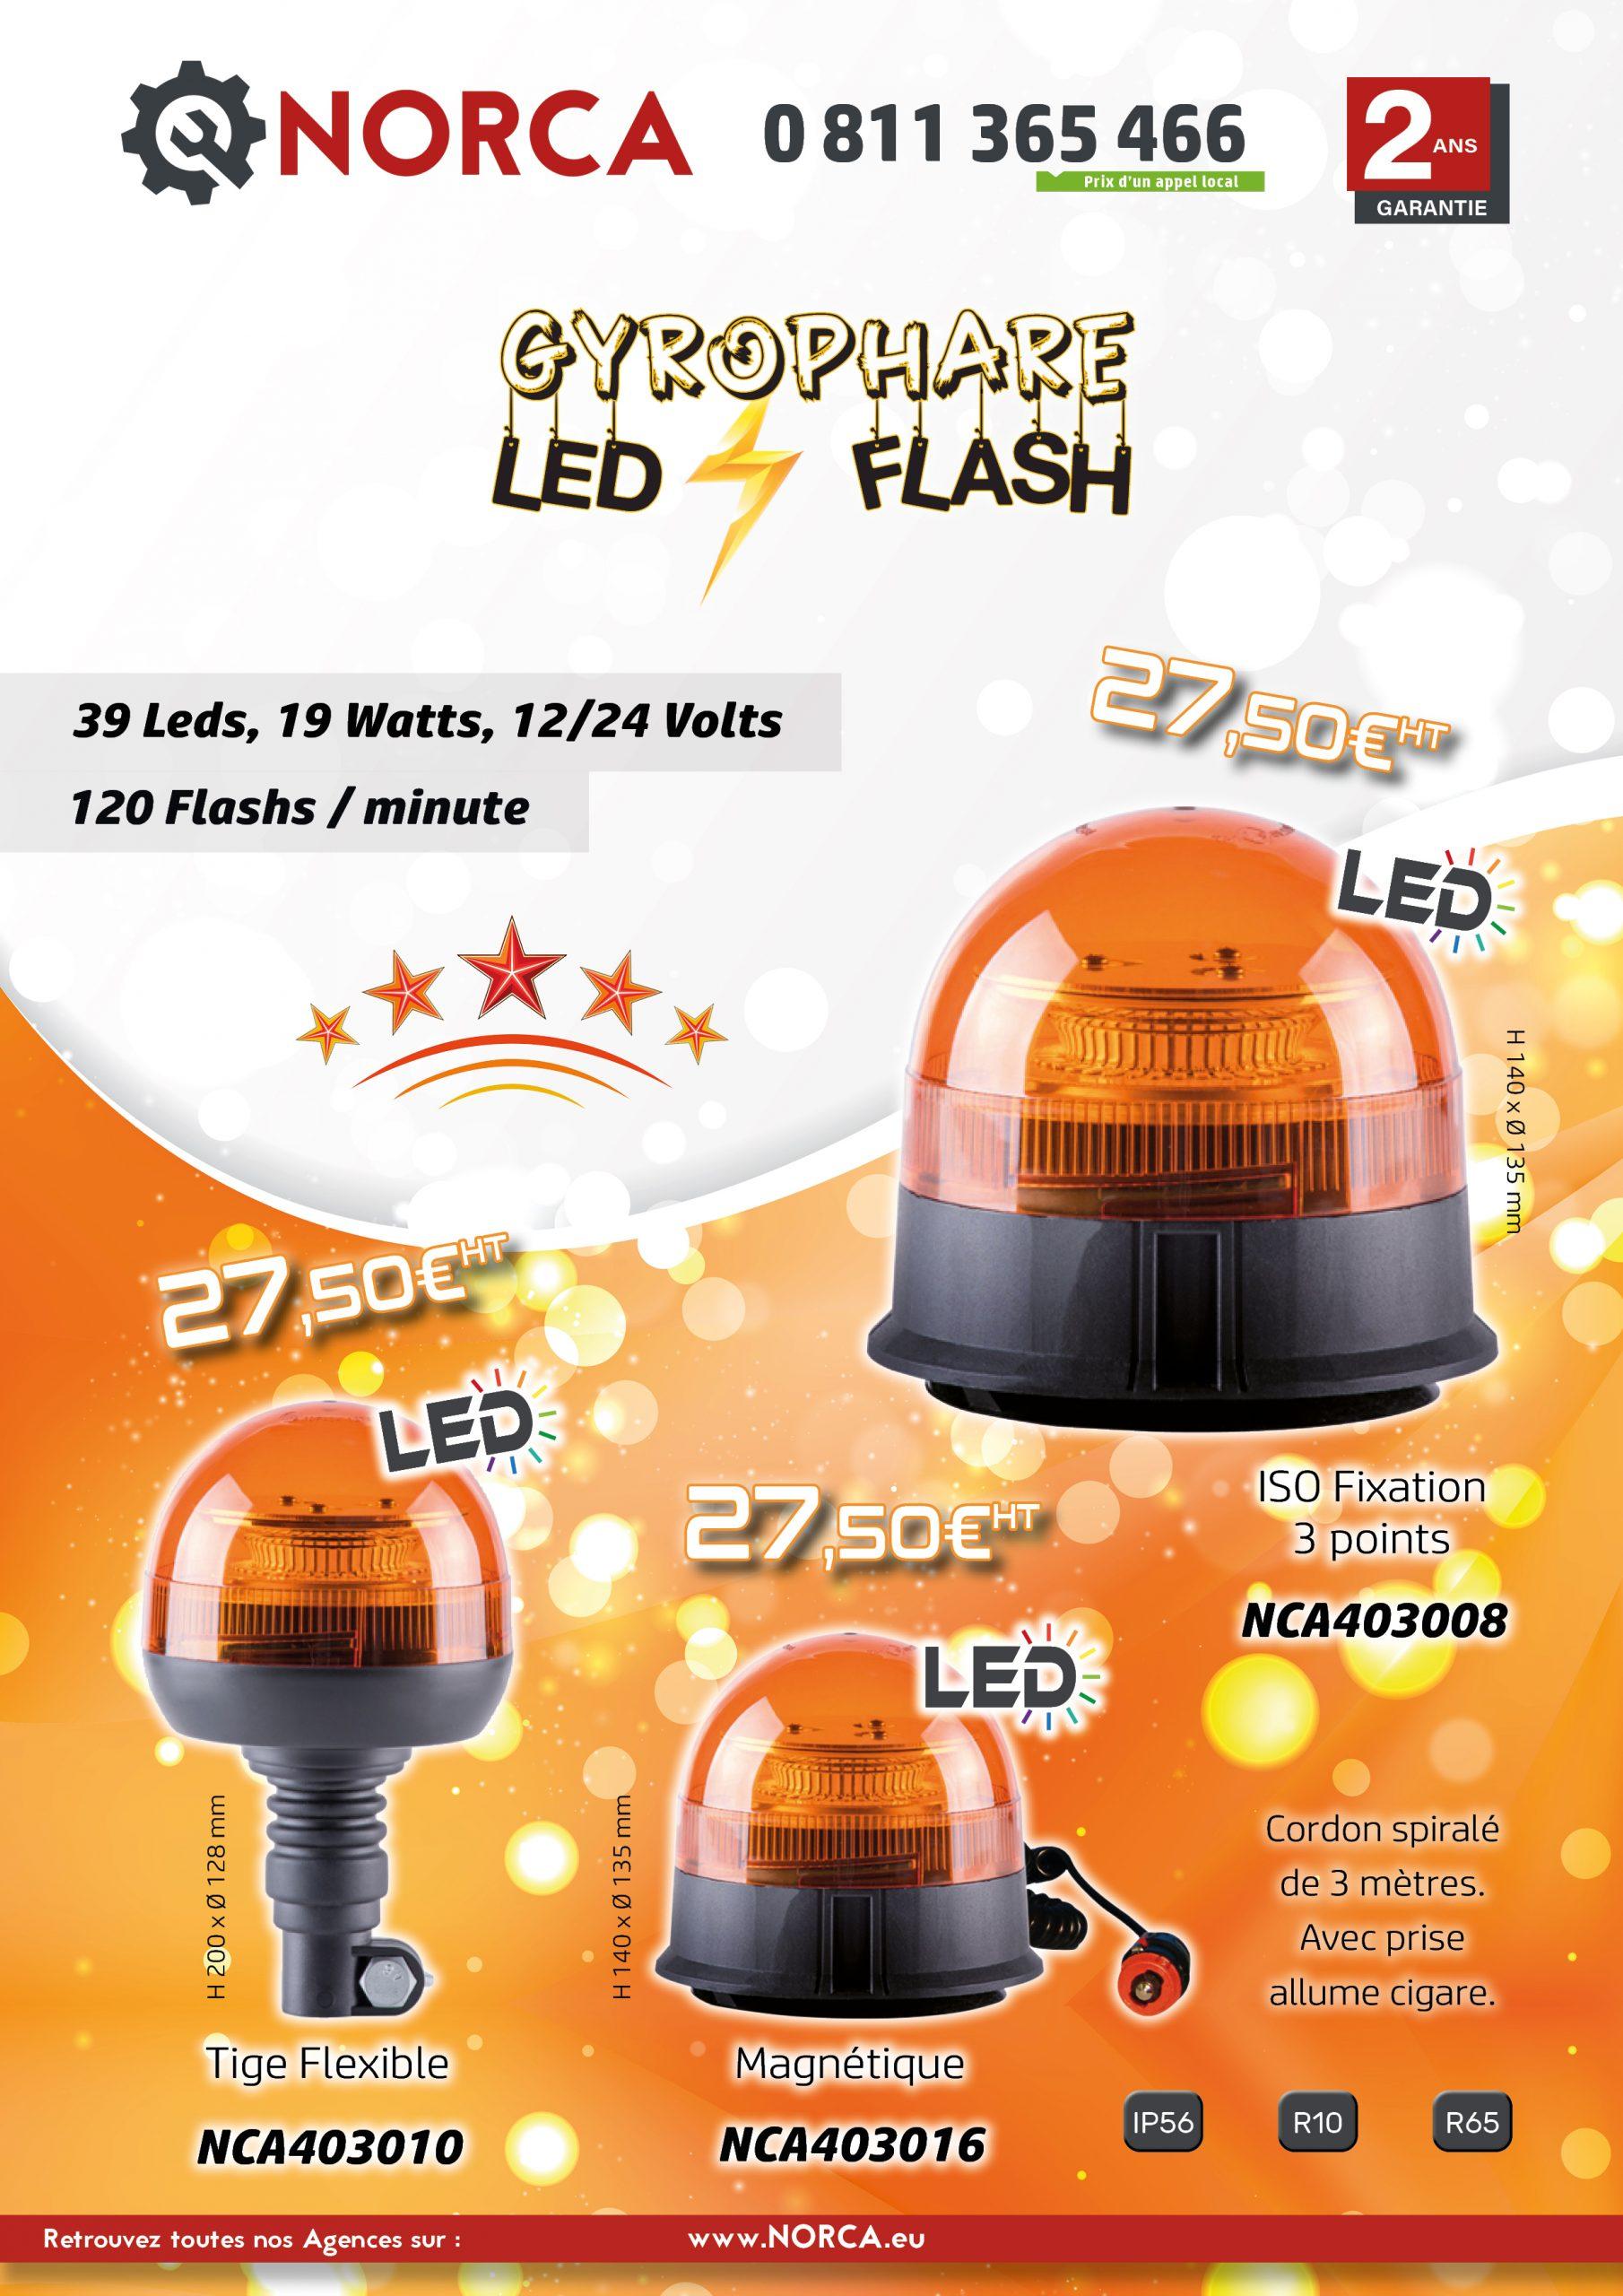 OP Gyrophares LED Flash NORCA